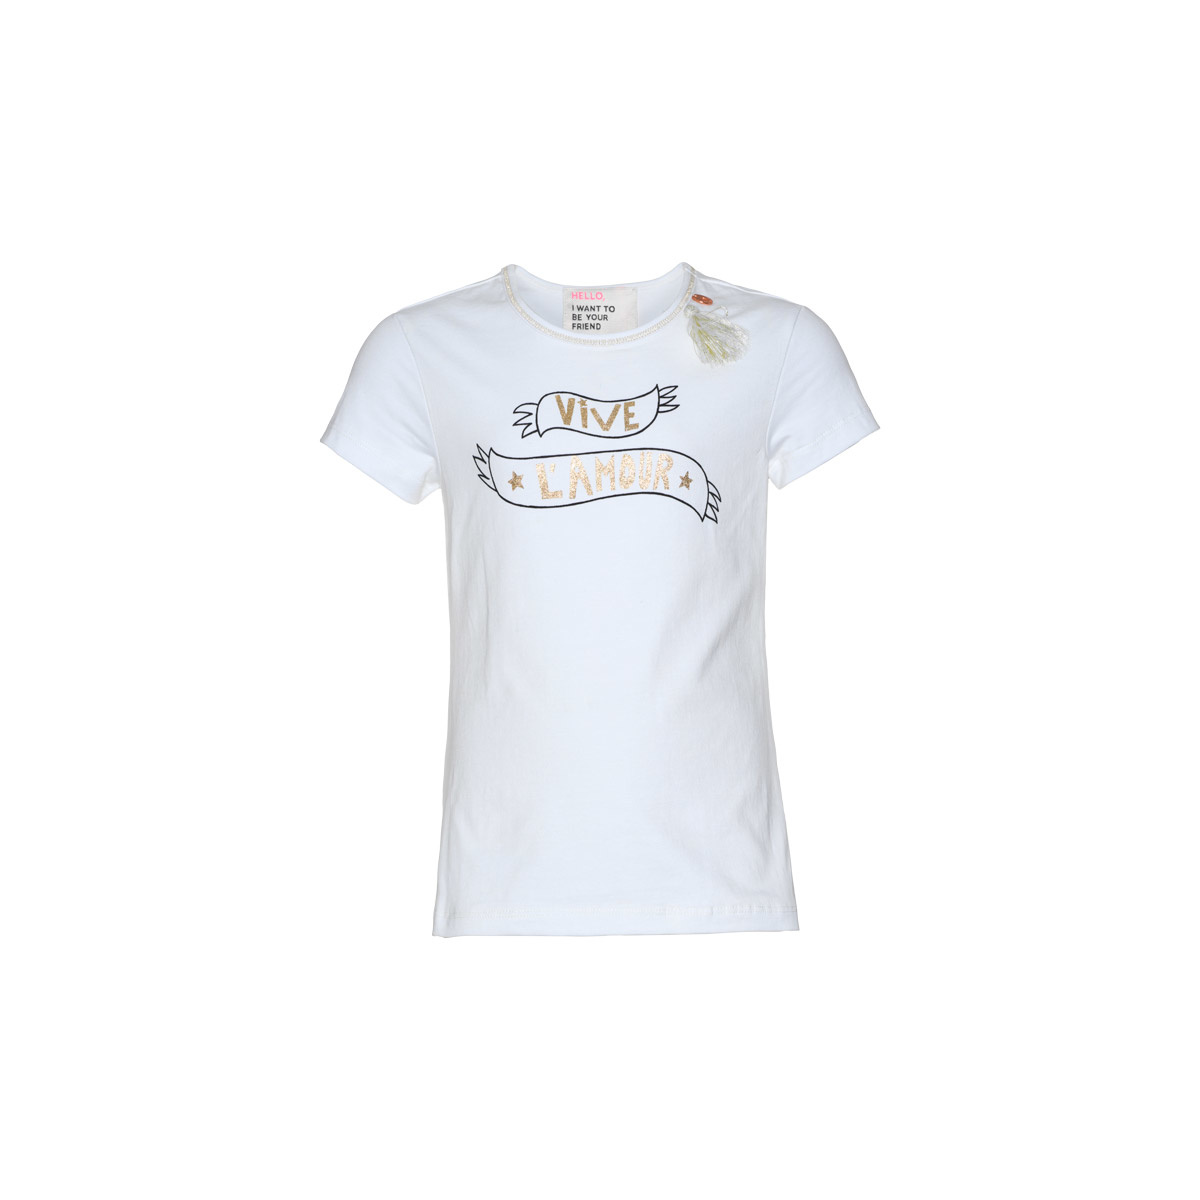 Mim-Pi Mim-Pi T-shirt mim 212